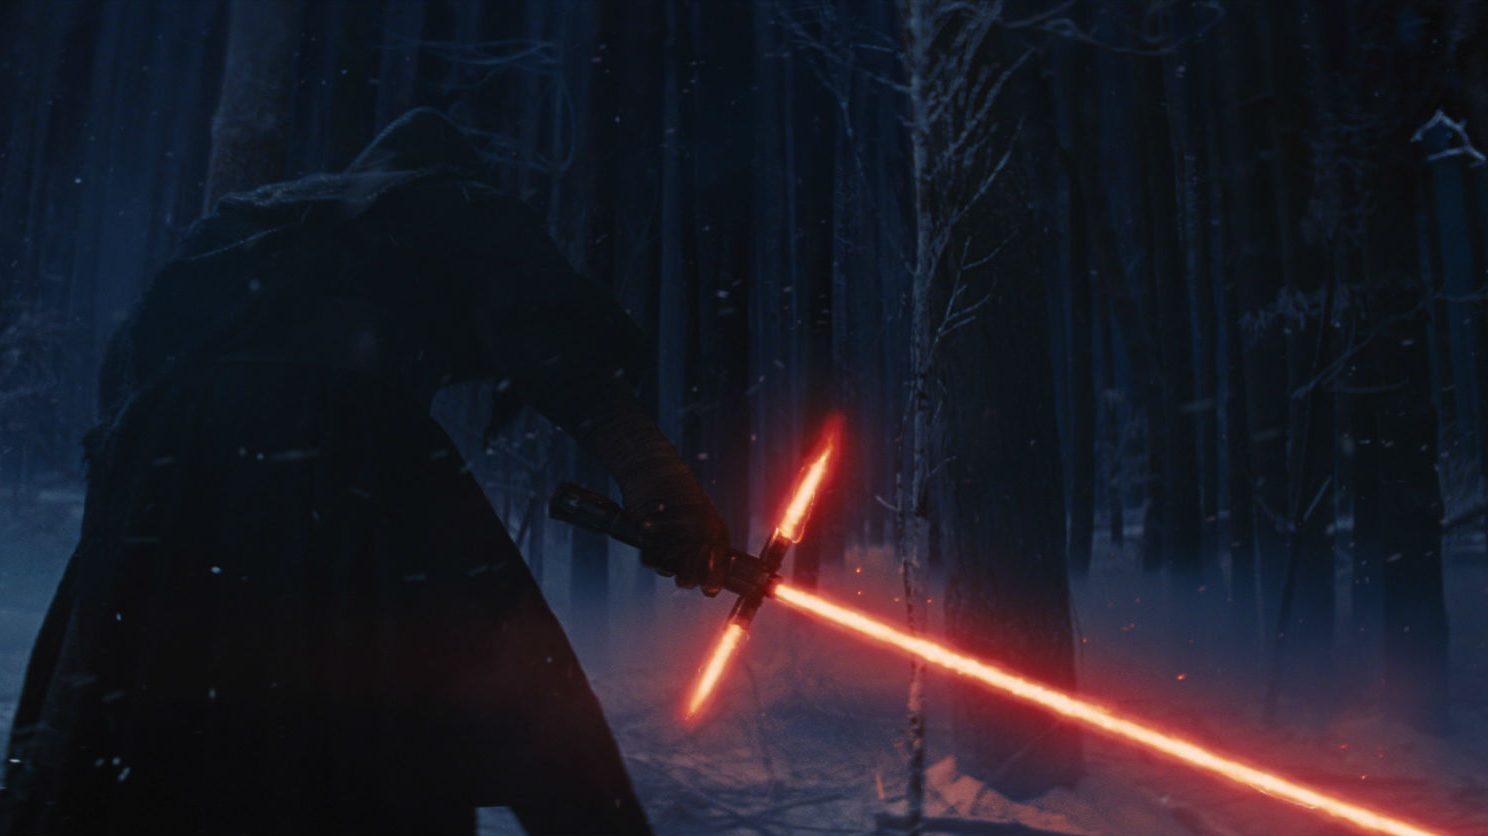 Rivelata l'origine della spada laser di Kylo Ren thumbnail